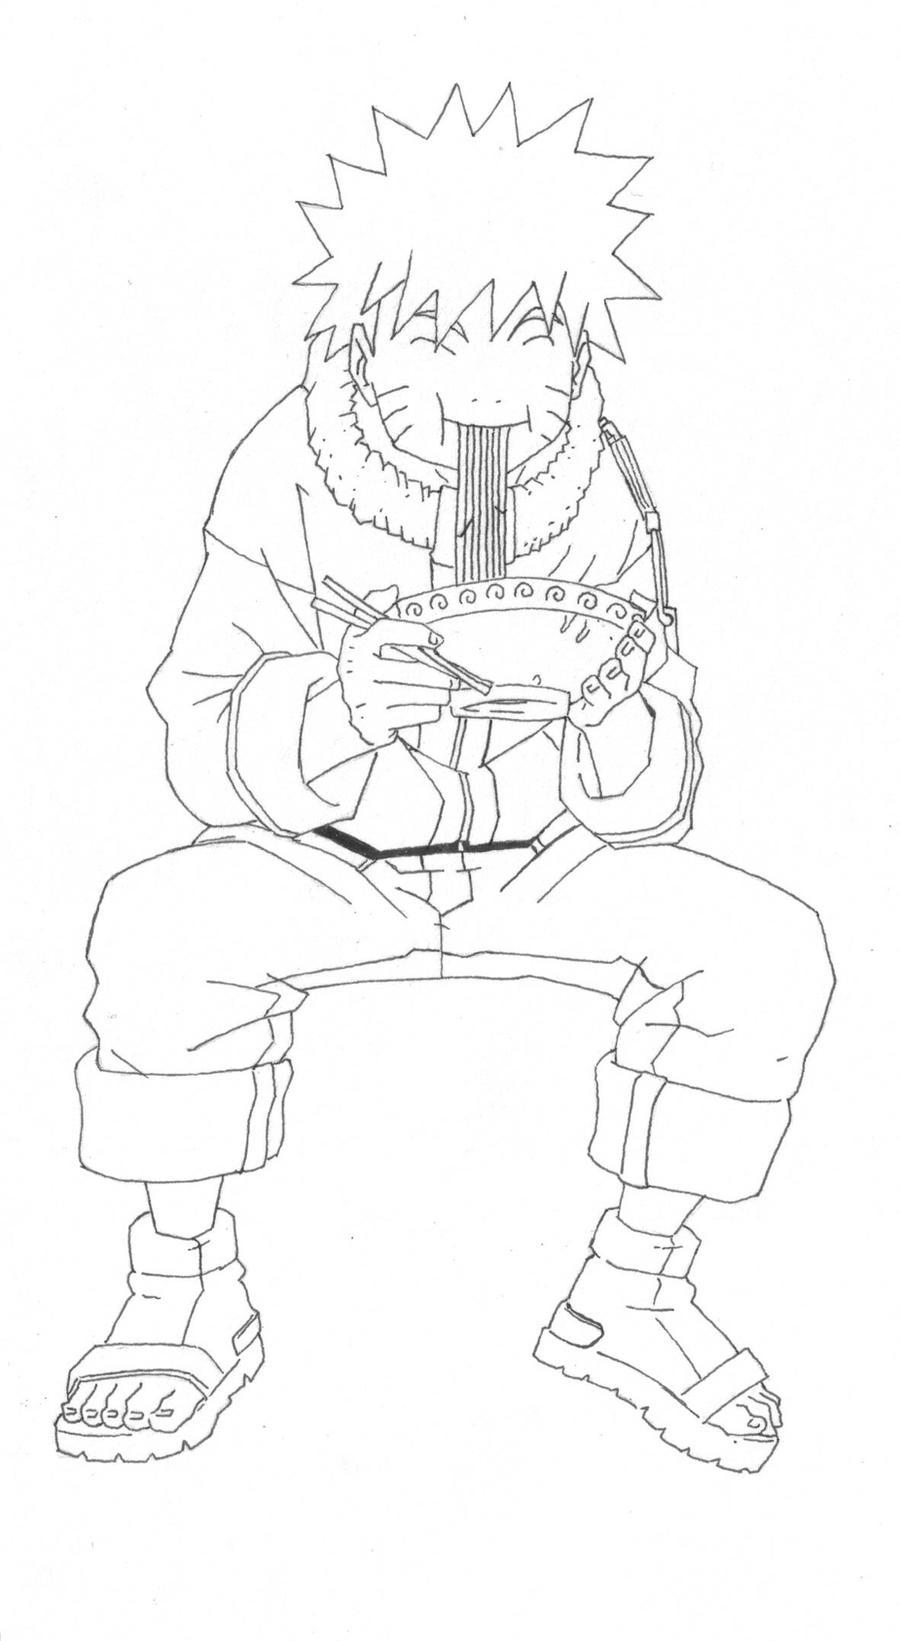 naruto eating ramen coloring pages - photo#21